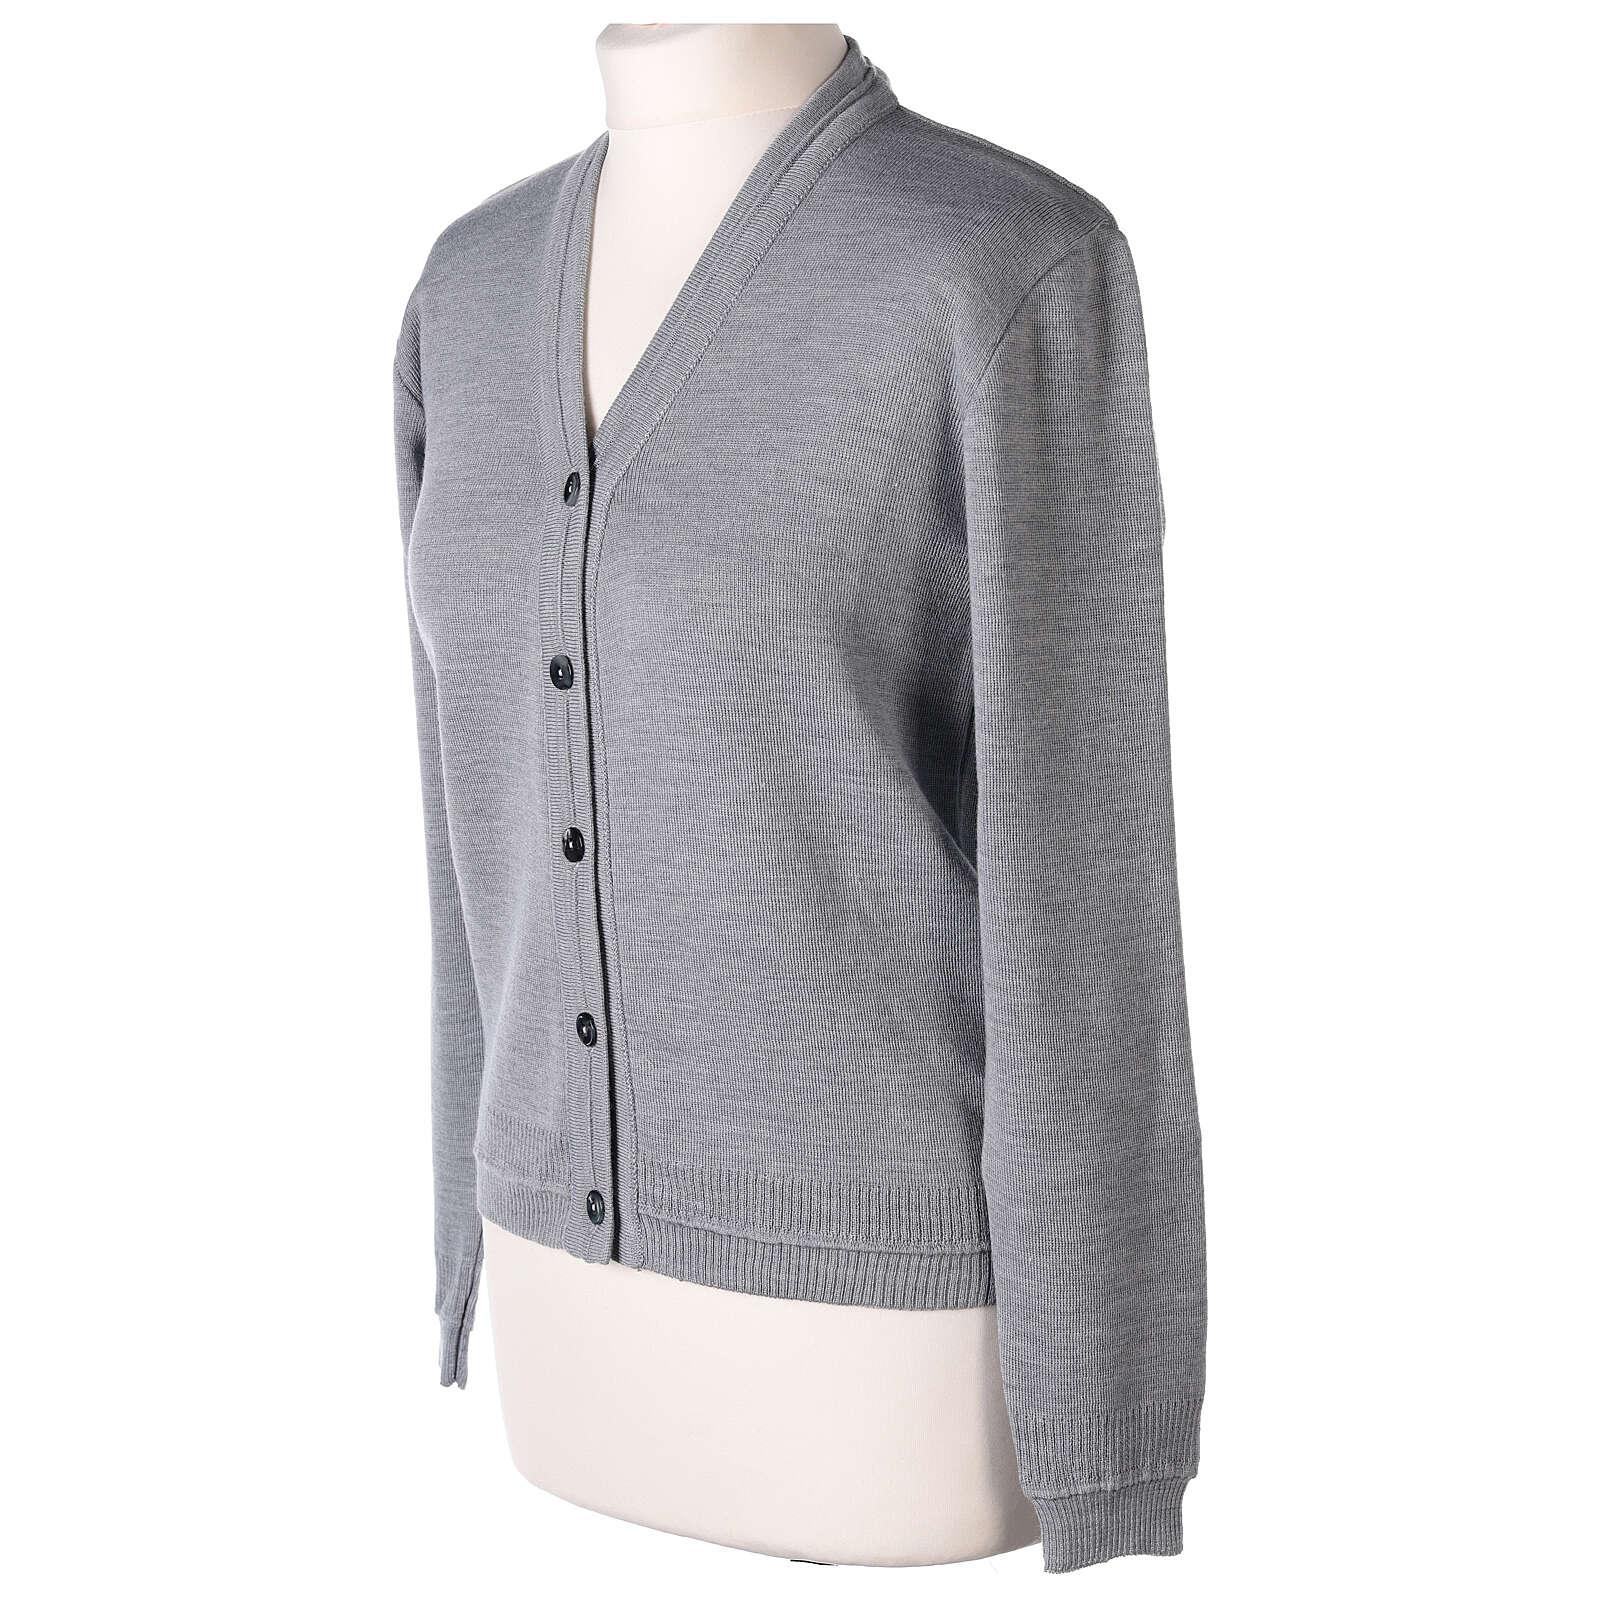 Chaqueta corta gris perla 50% lana merina 50% acrílico monja In Primis 4